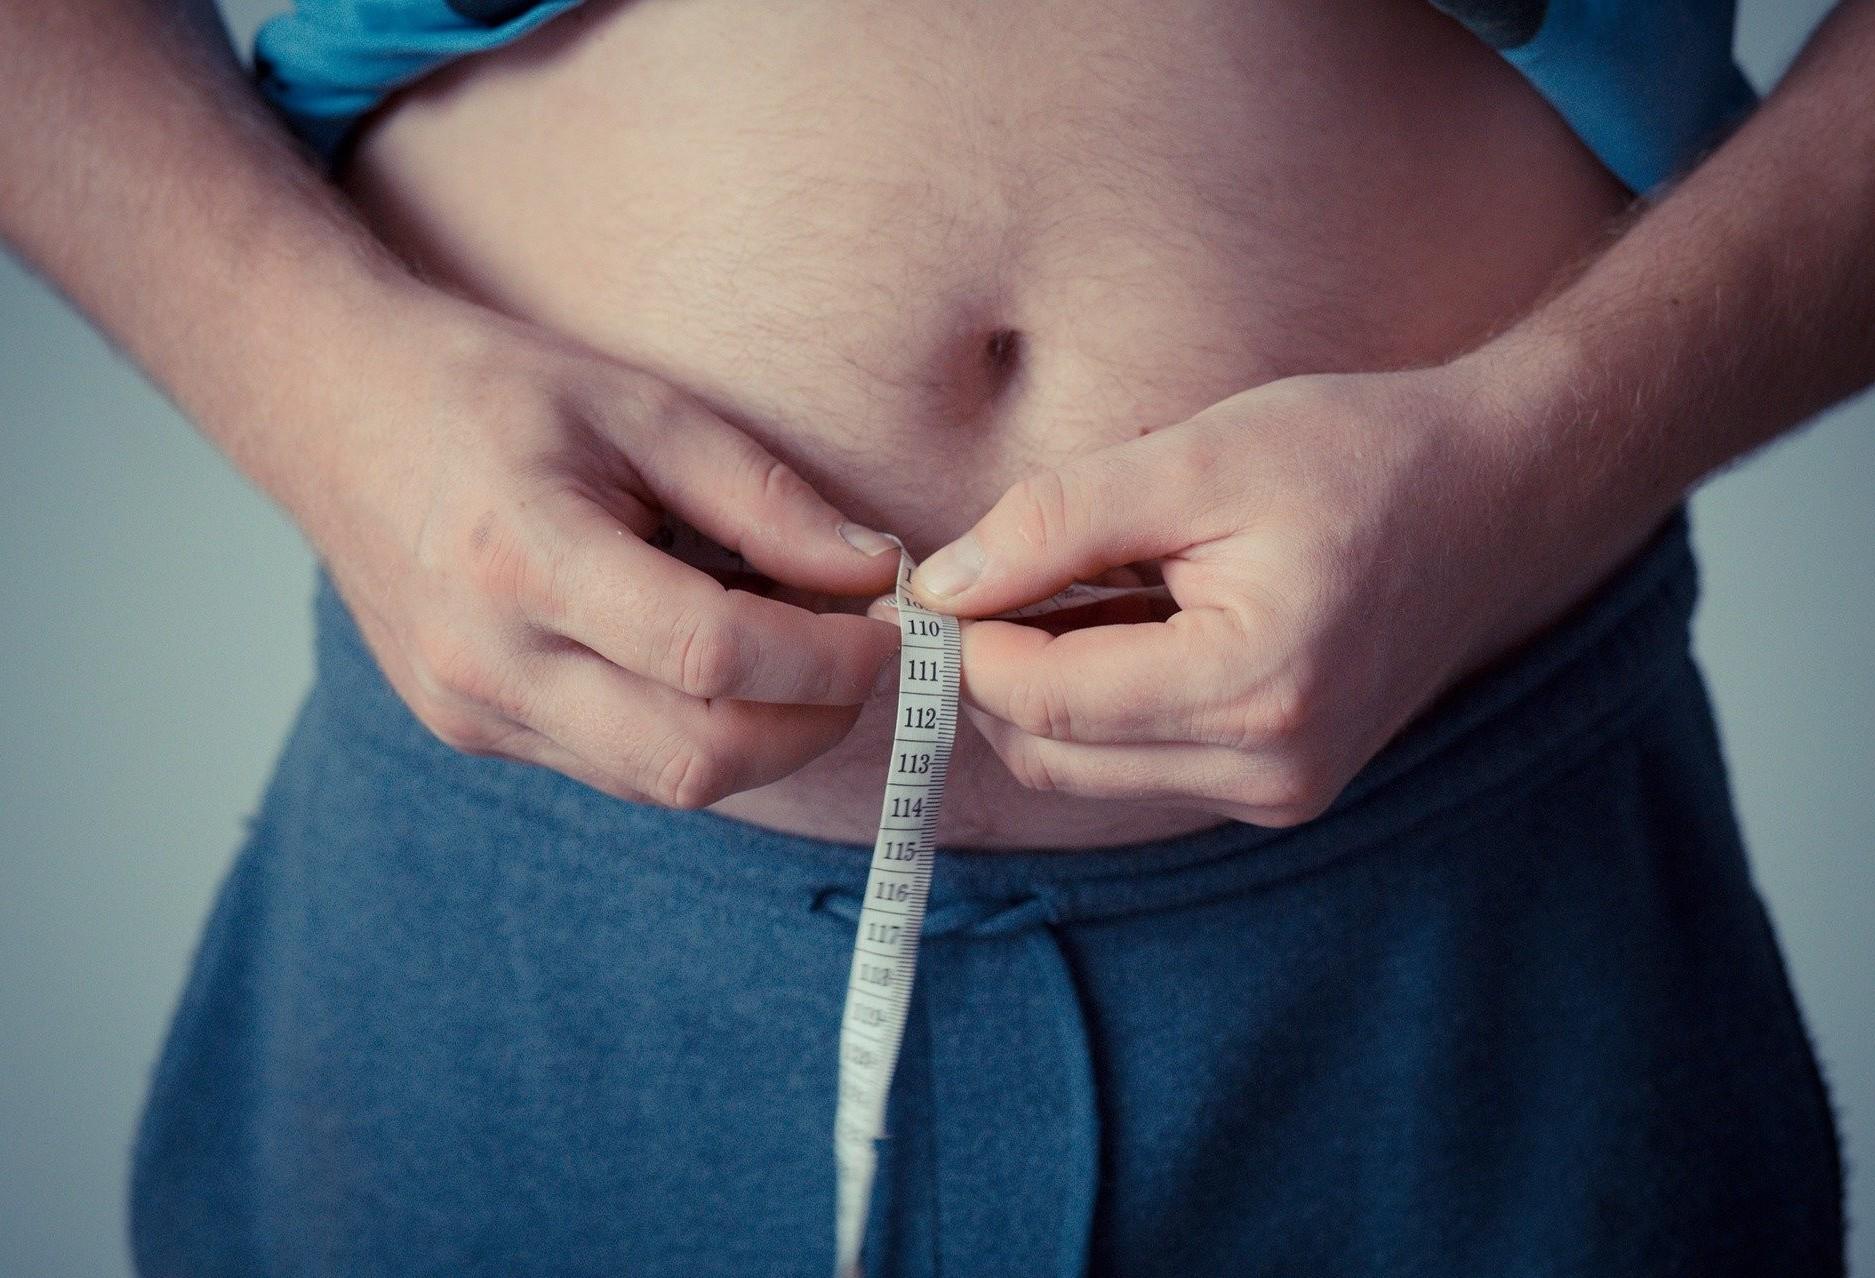 Obesidade é fator de risco para Covid-19